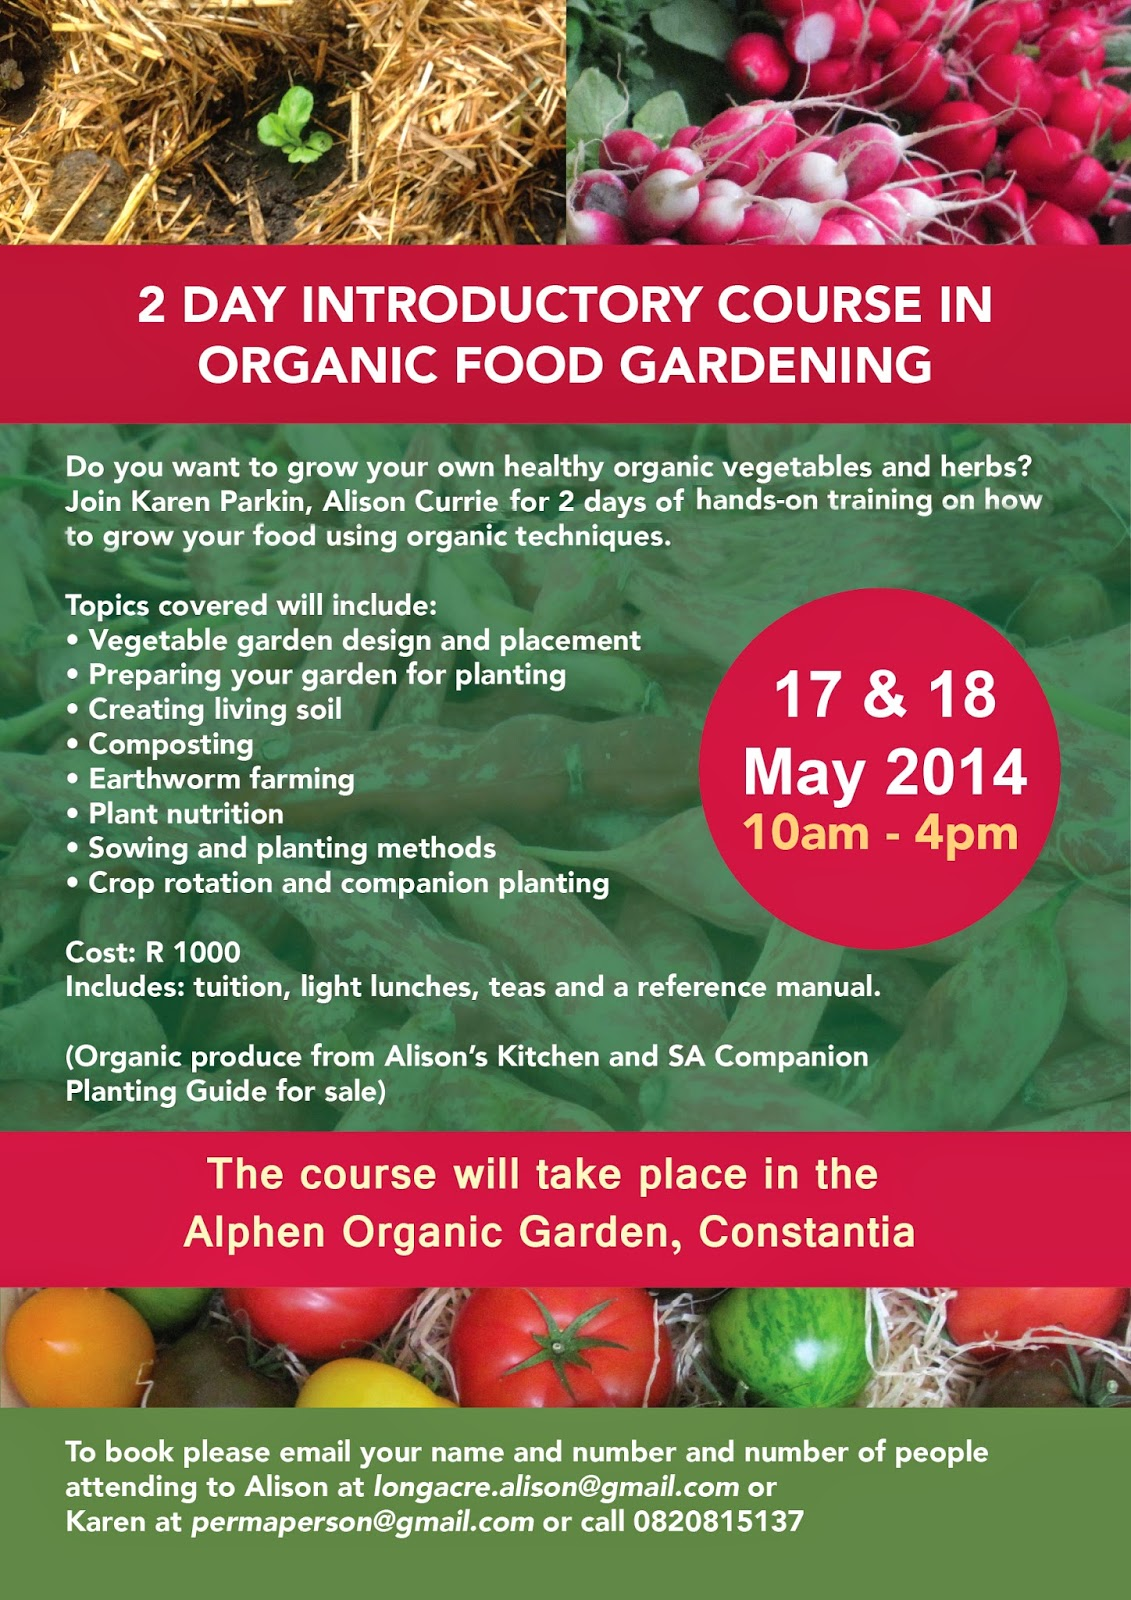 2 Day Intro to Organic Gardening